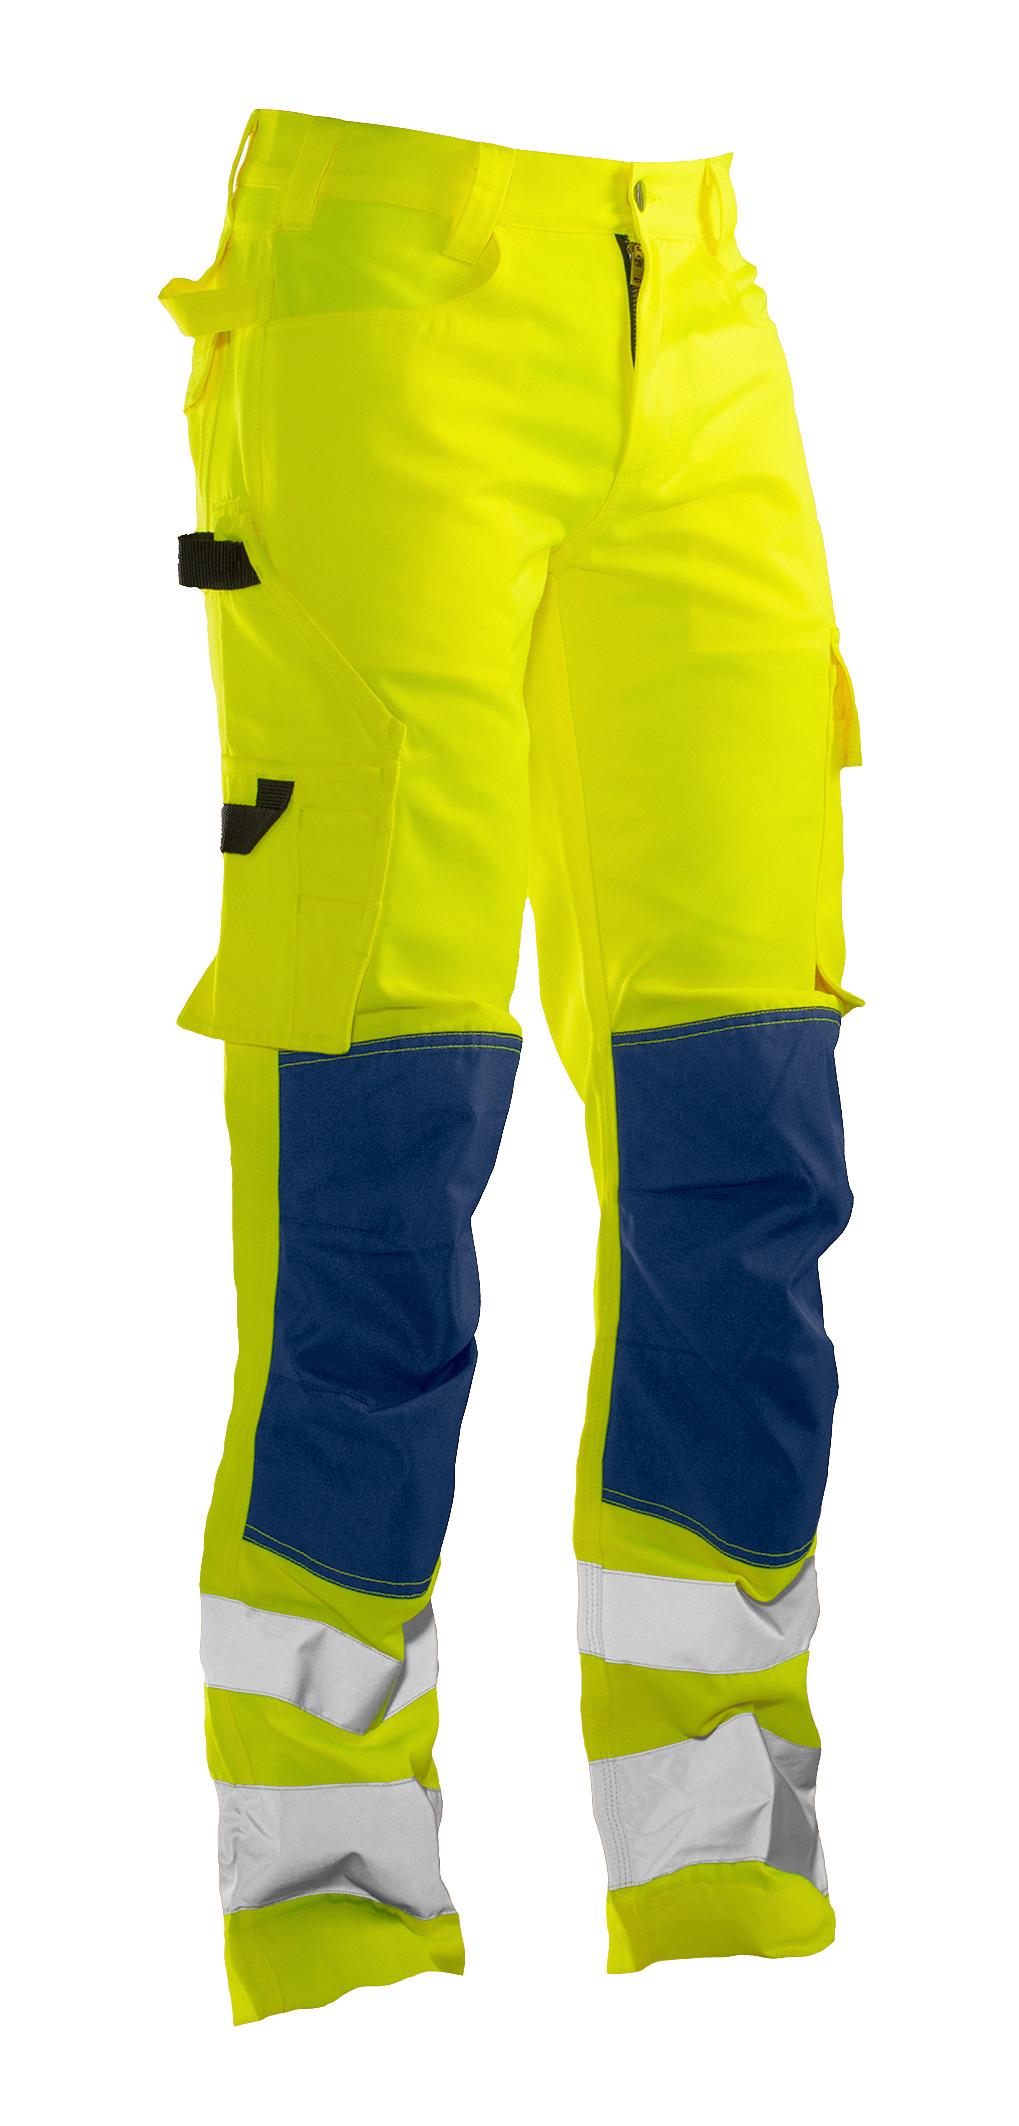 2378 PANTALON DE SERVICE HI-VIS C42 jaune/bleu marine